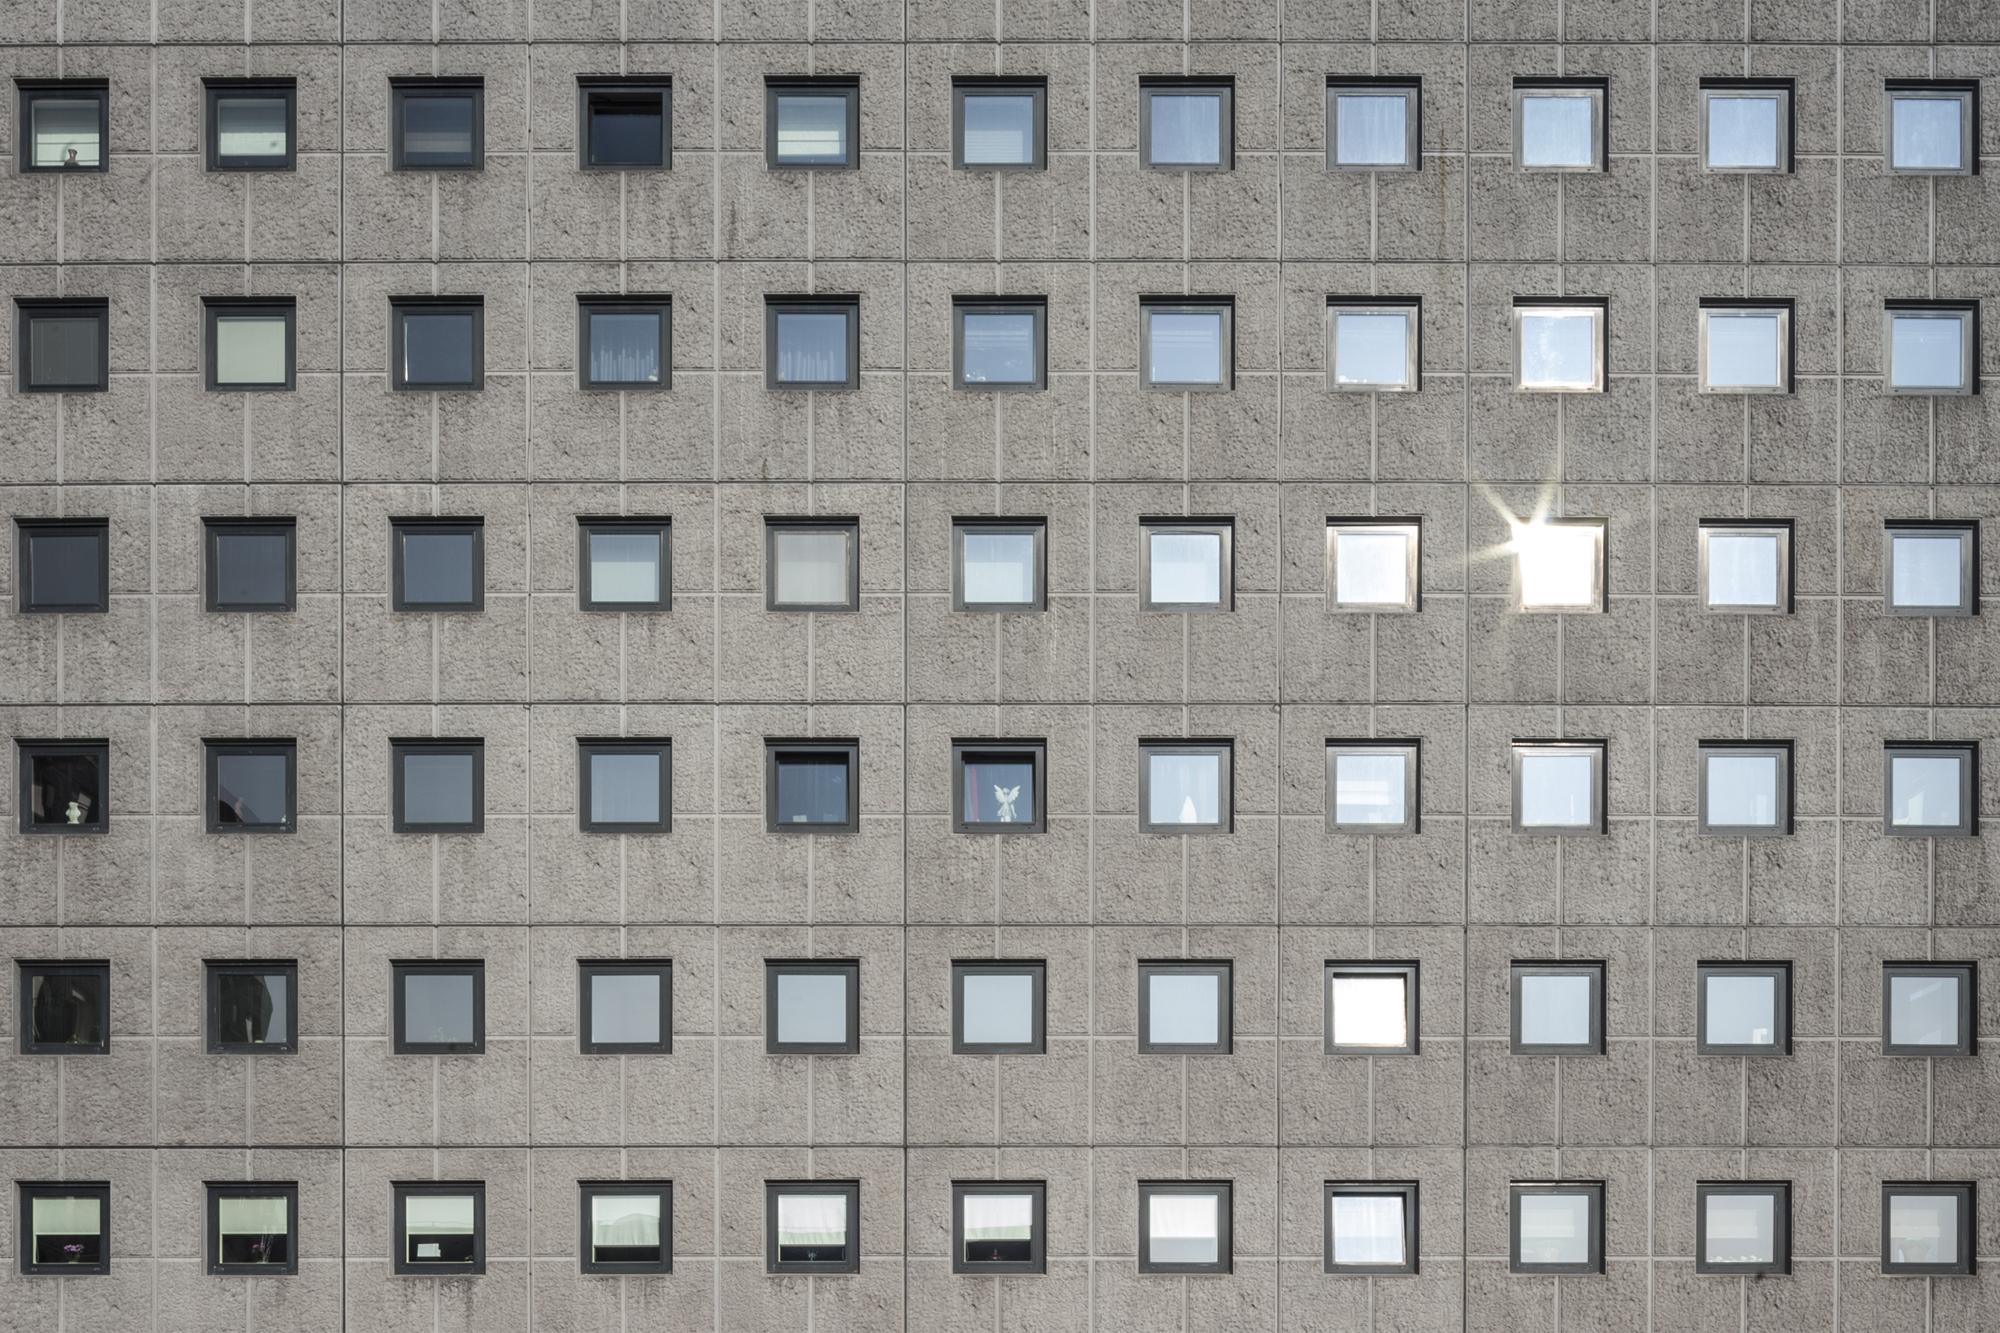 WestPoint, Tilburg, Nederland, Brutalism, architecture,